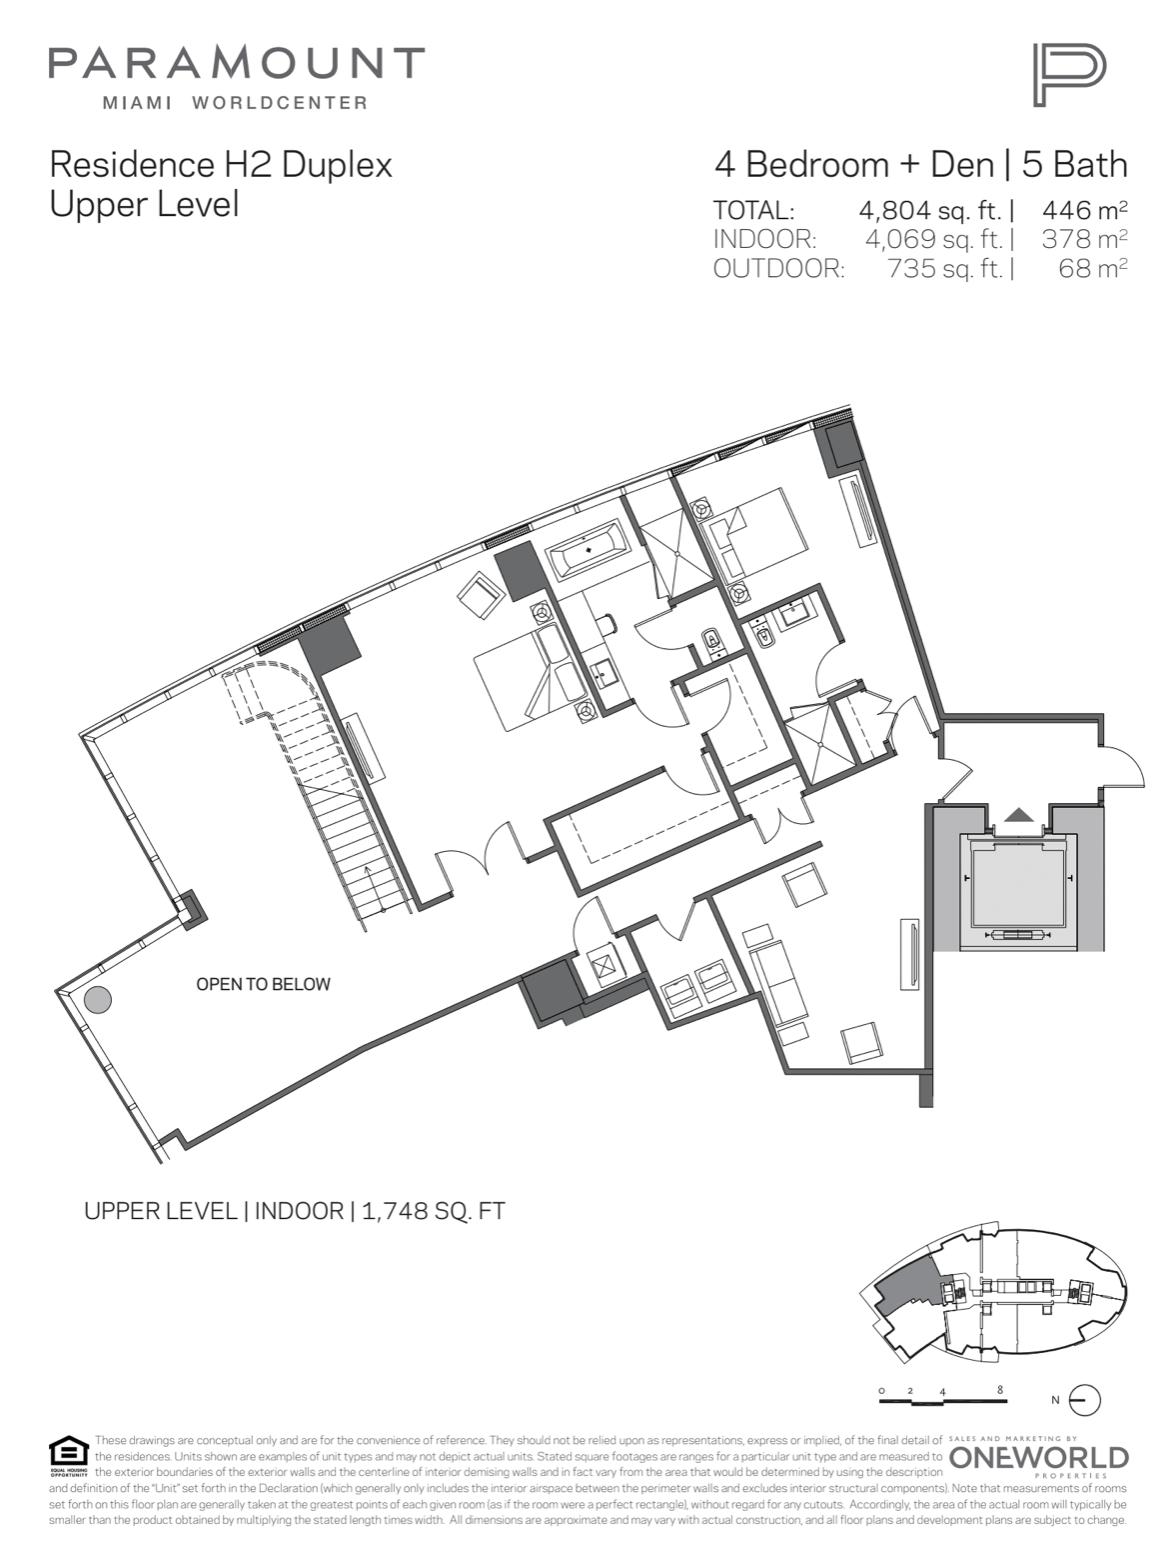 PMWC Penthouse H2 Upper Level